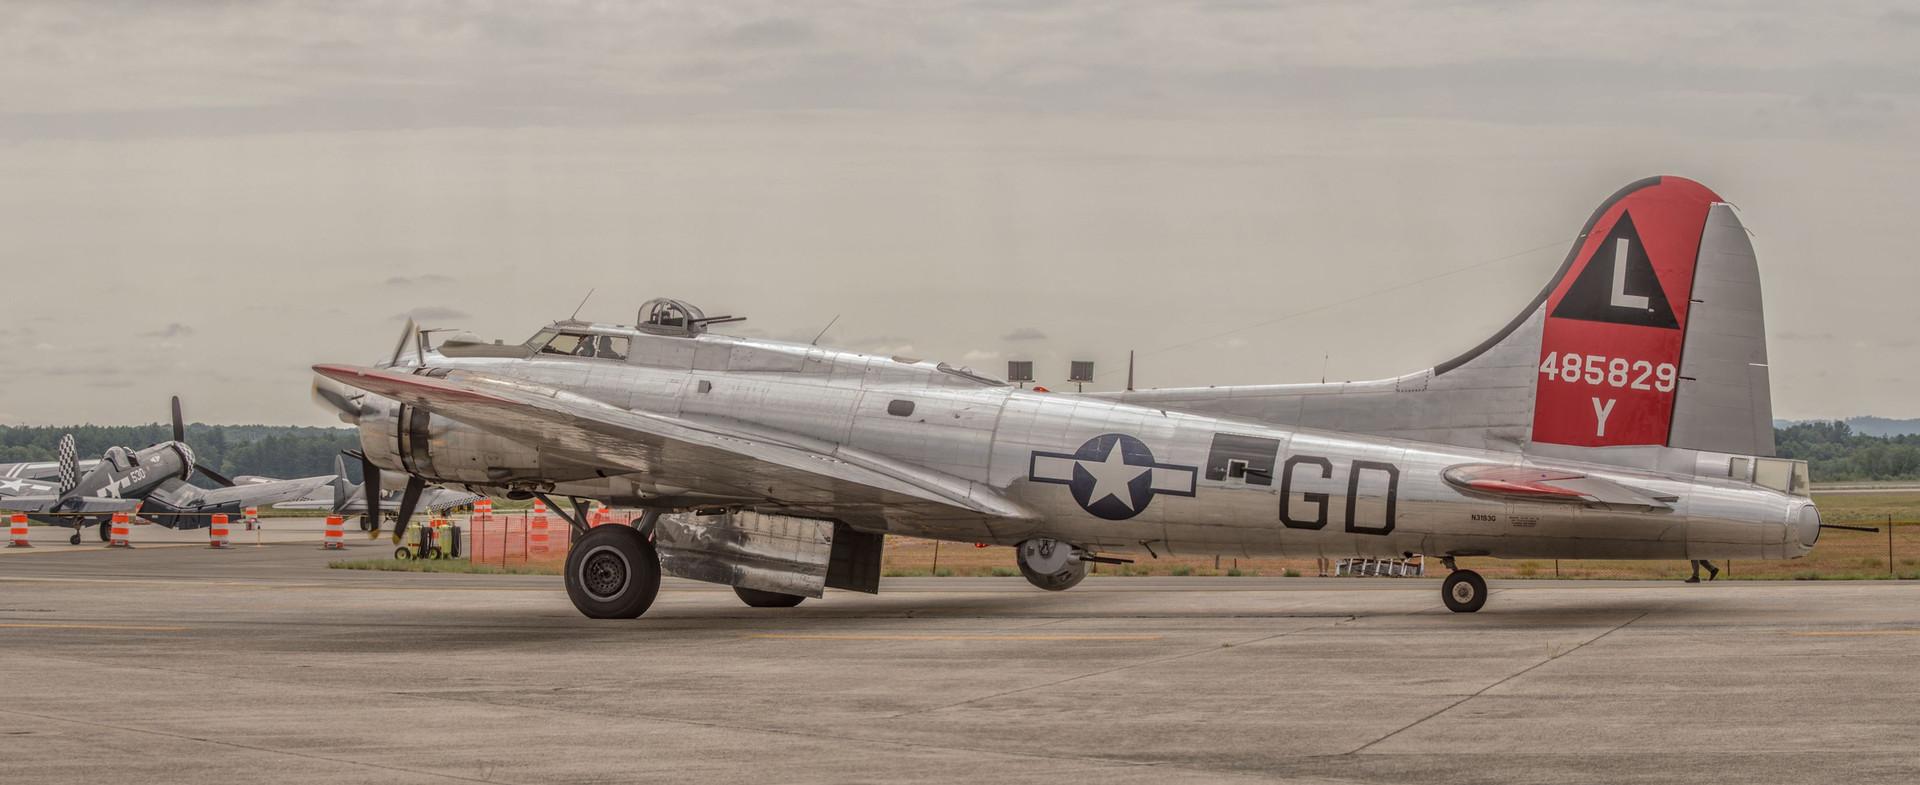 b-17_pan.jpg